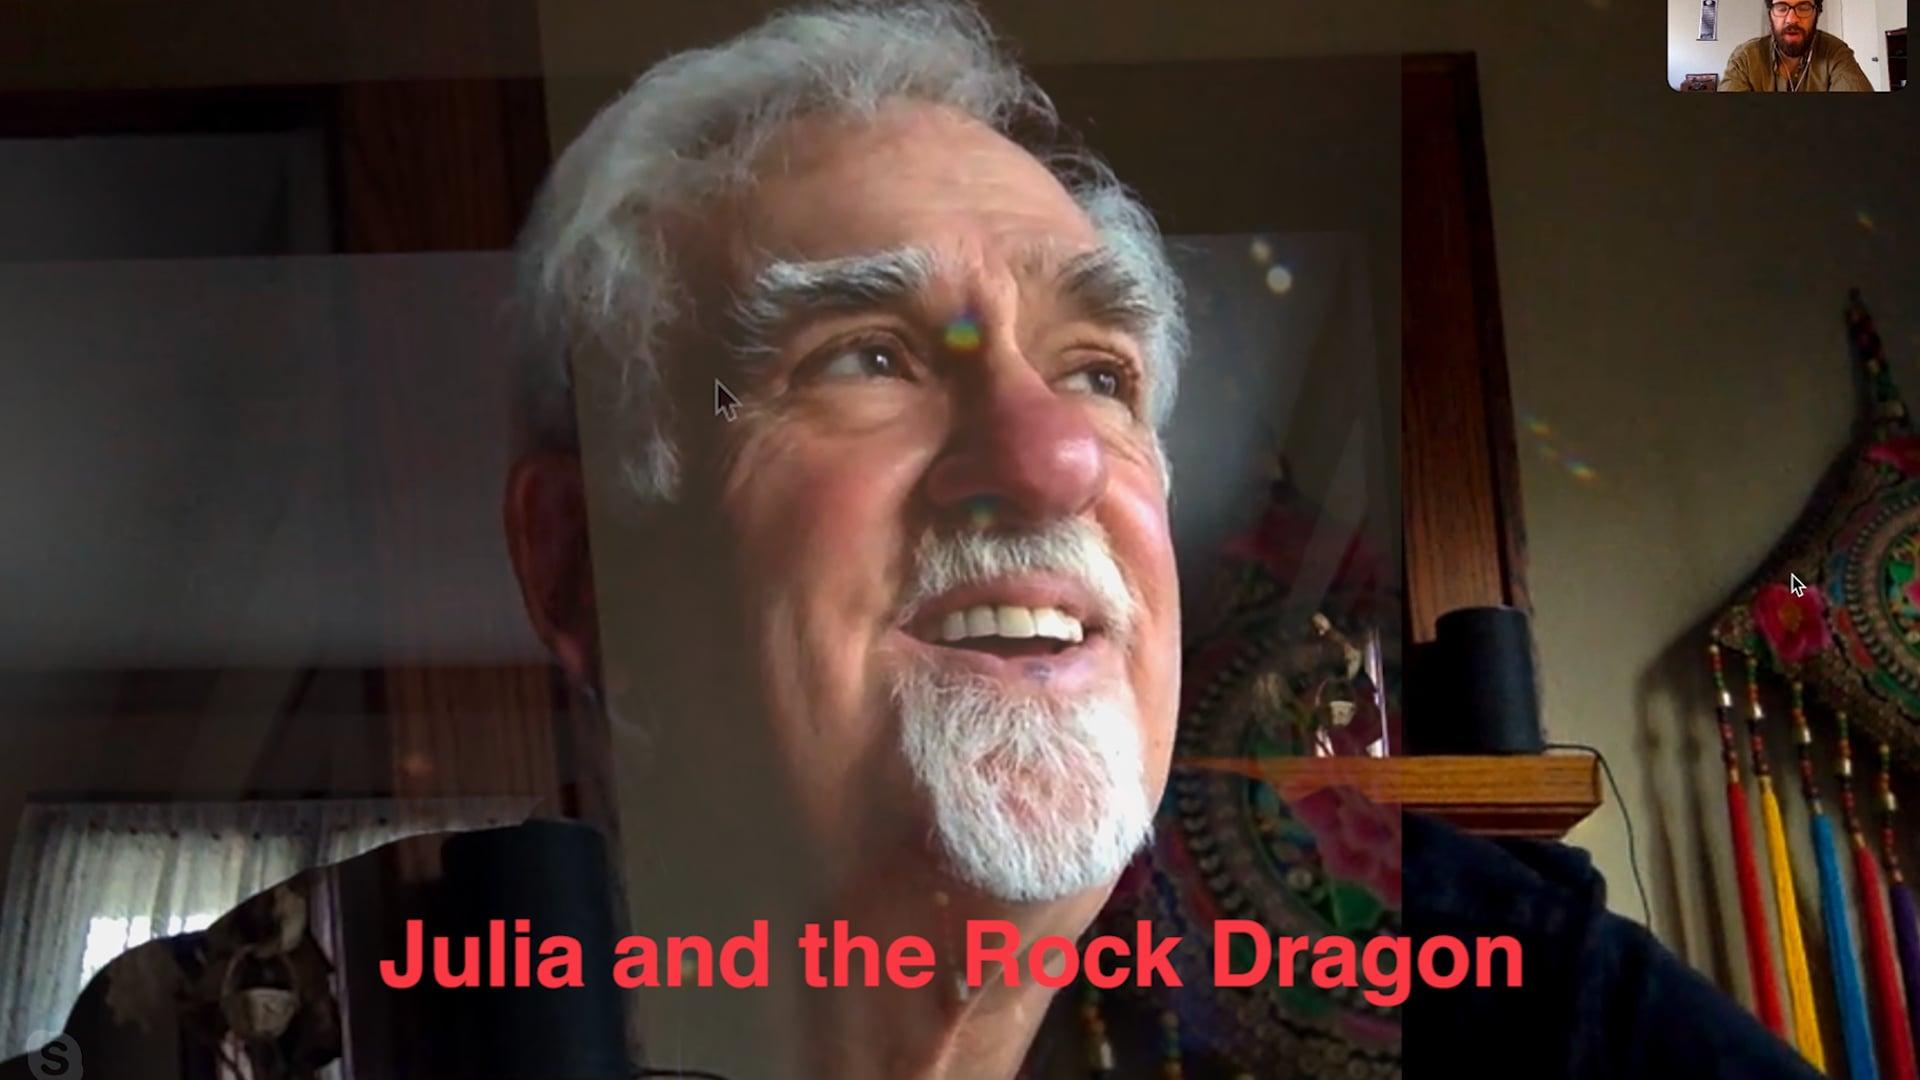 Julia and the Rock Dragon (Doc Hybrid Short)